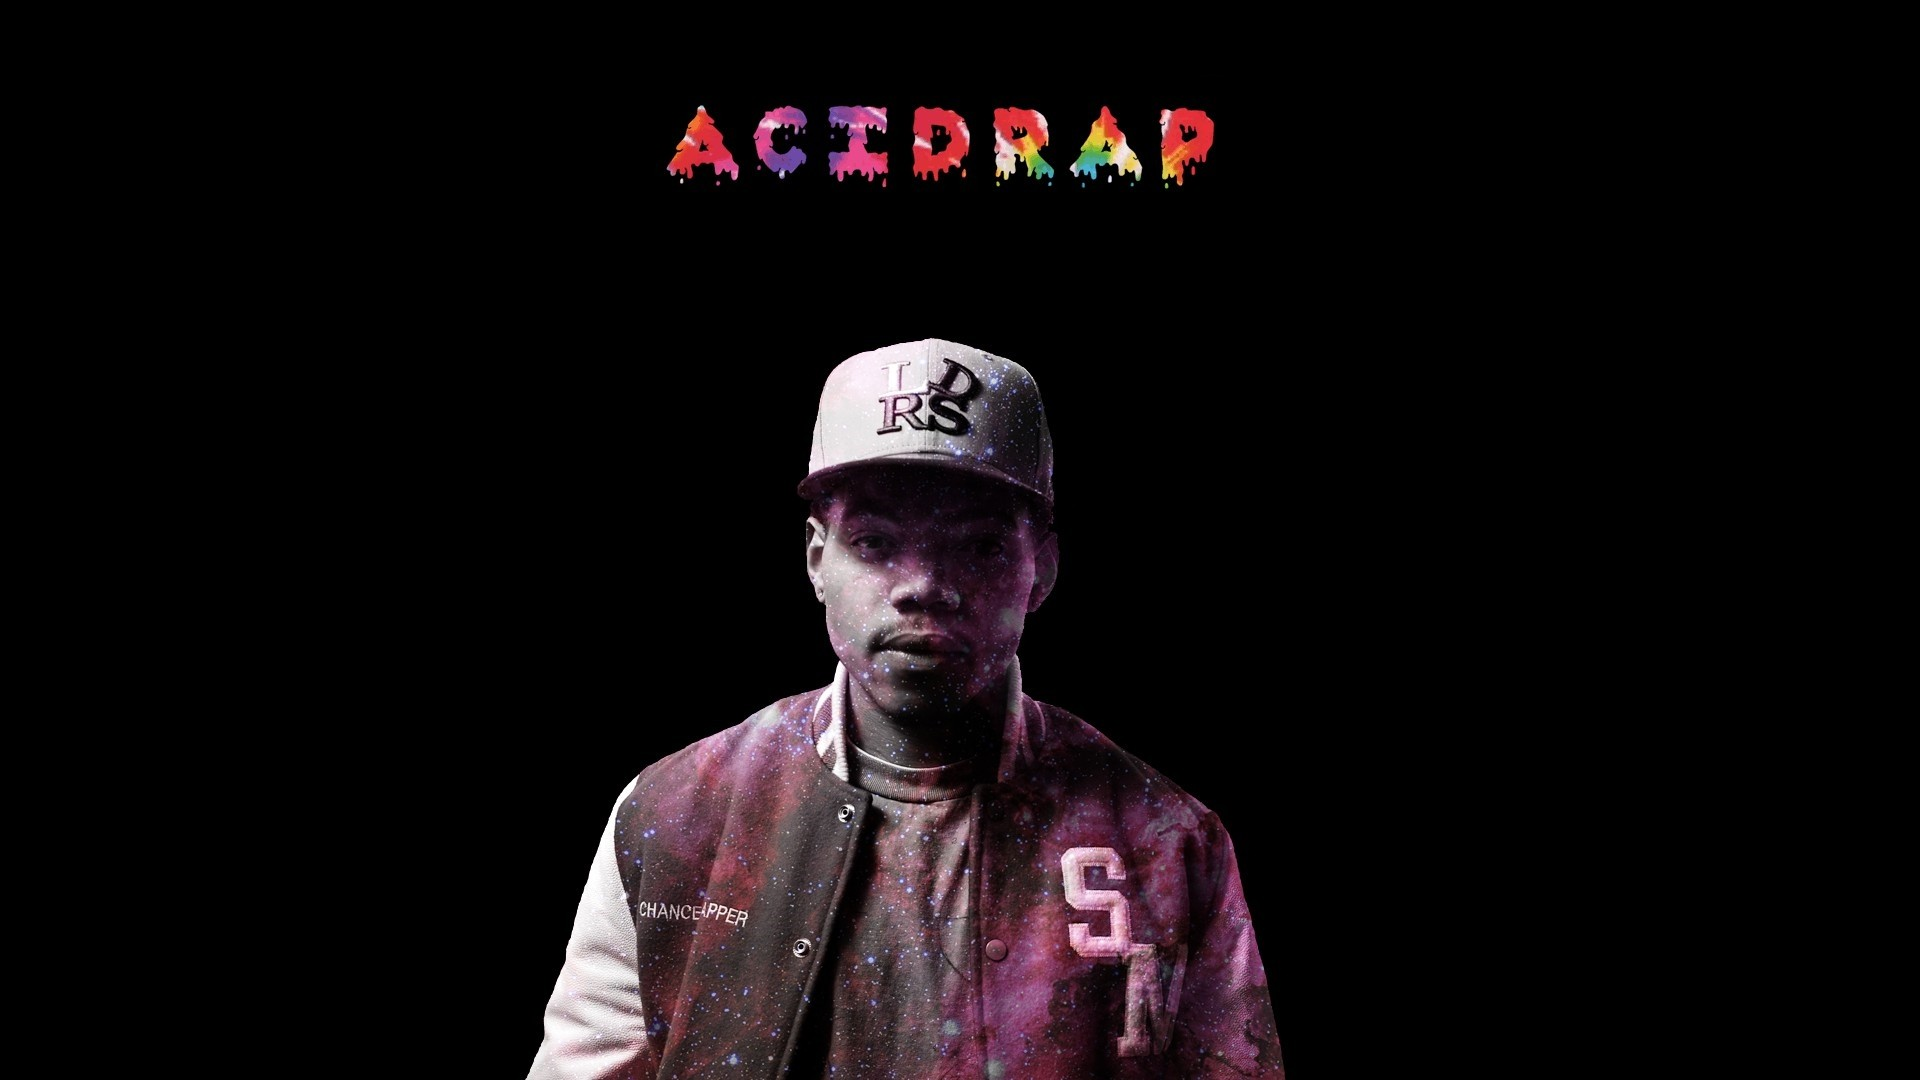 Chance The Rapper Free Wallpaper